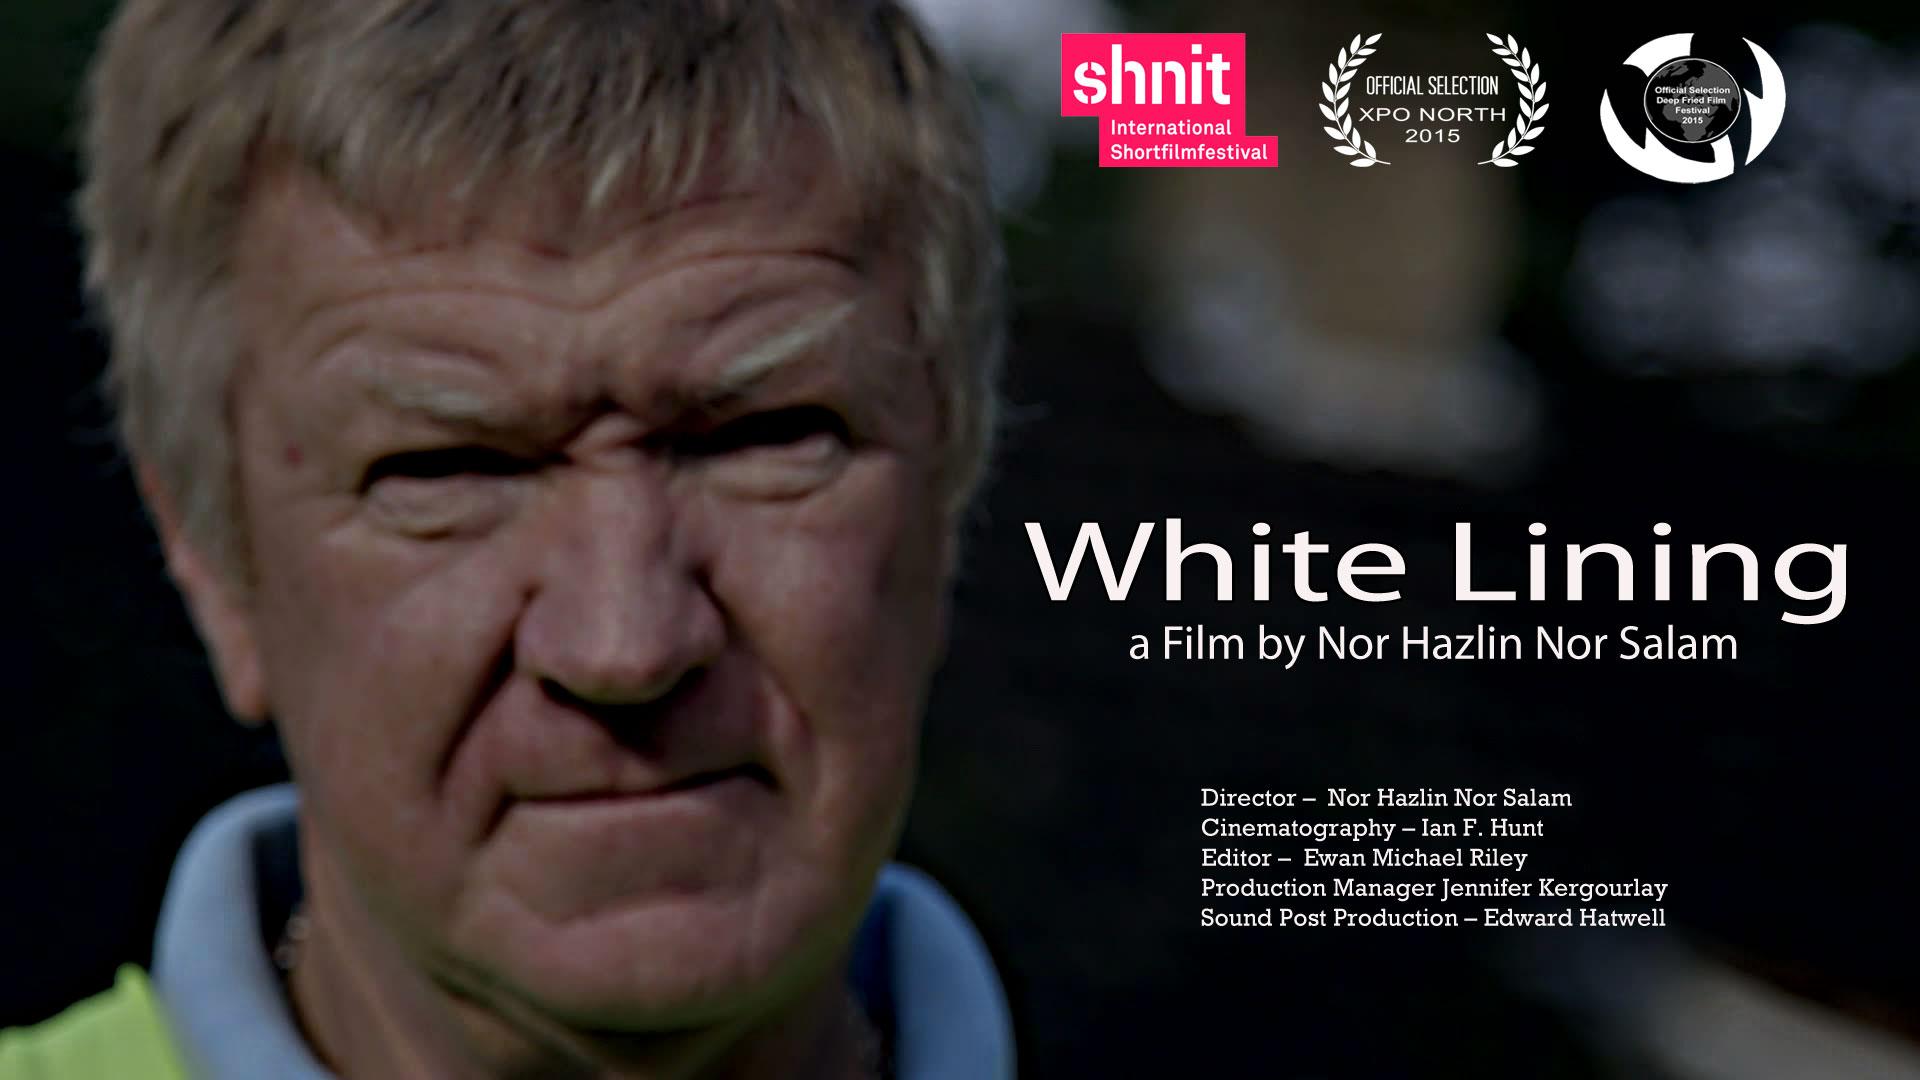 Award winning short film White Lining